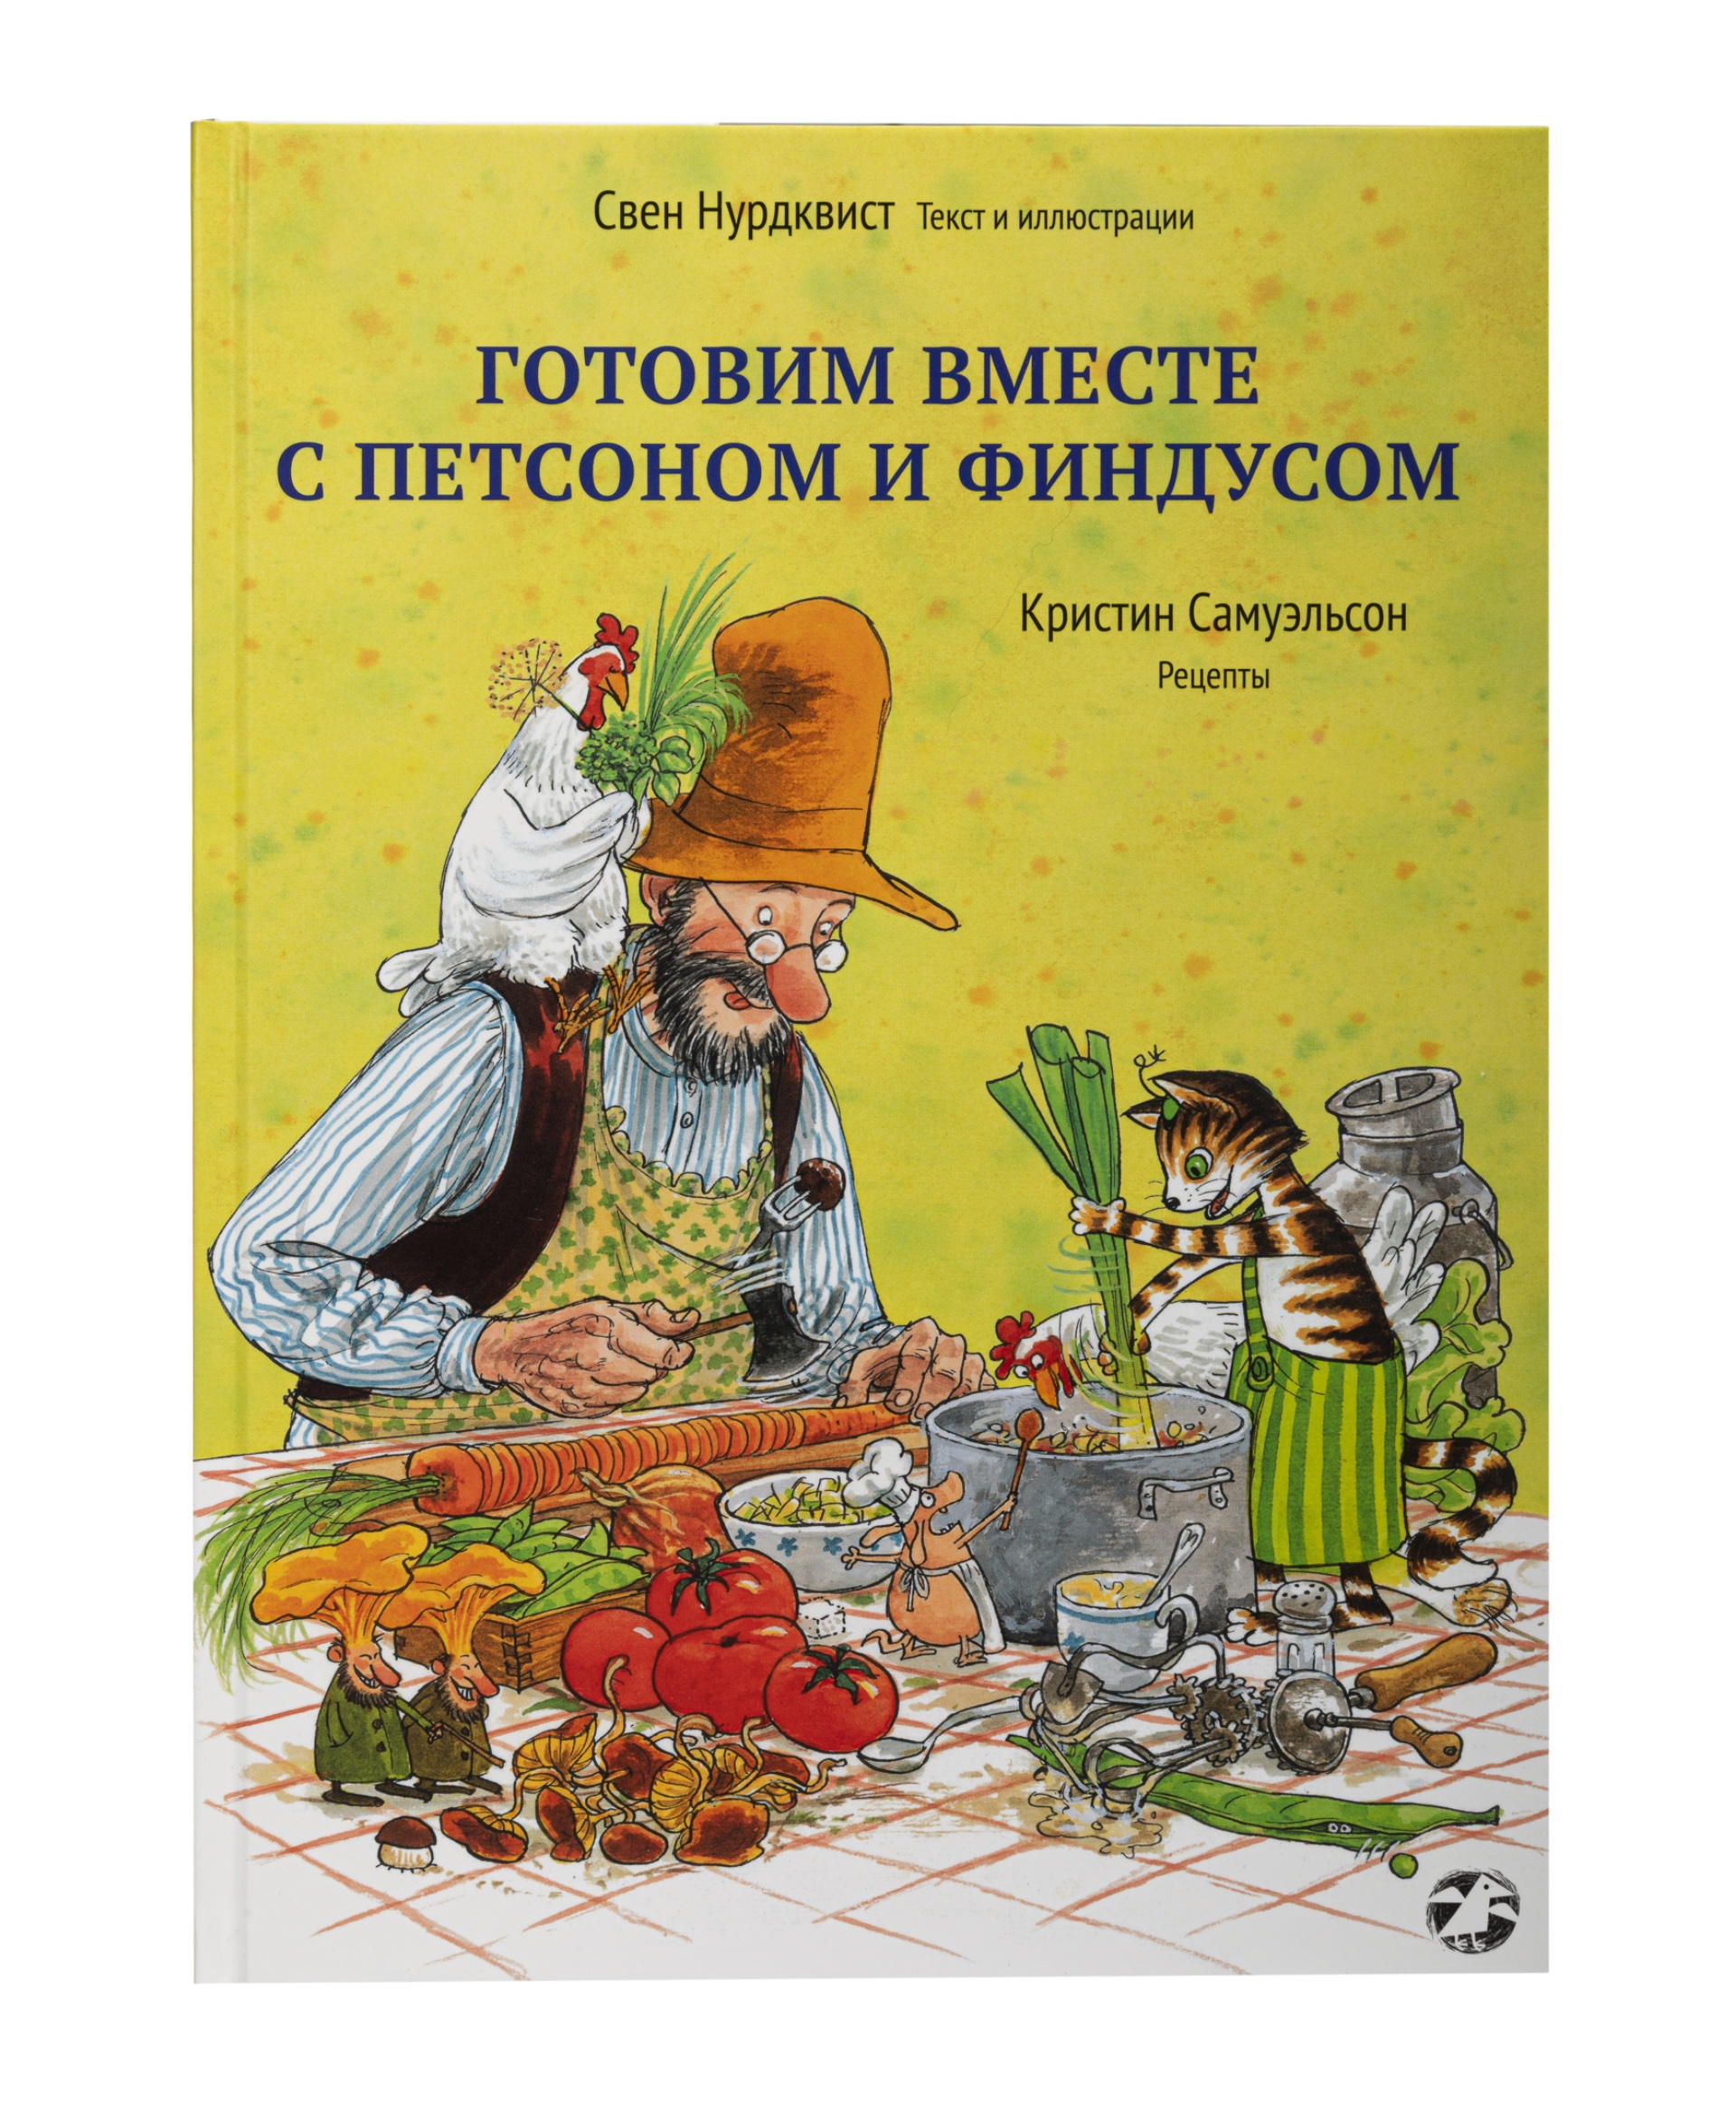 Белая Ворона книга 'Готовим вместе с Петсоном и Финдусом'